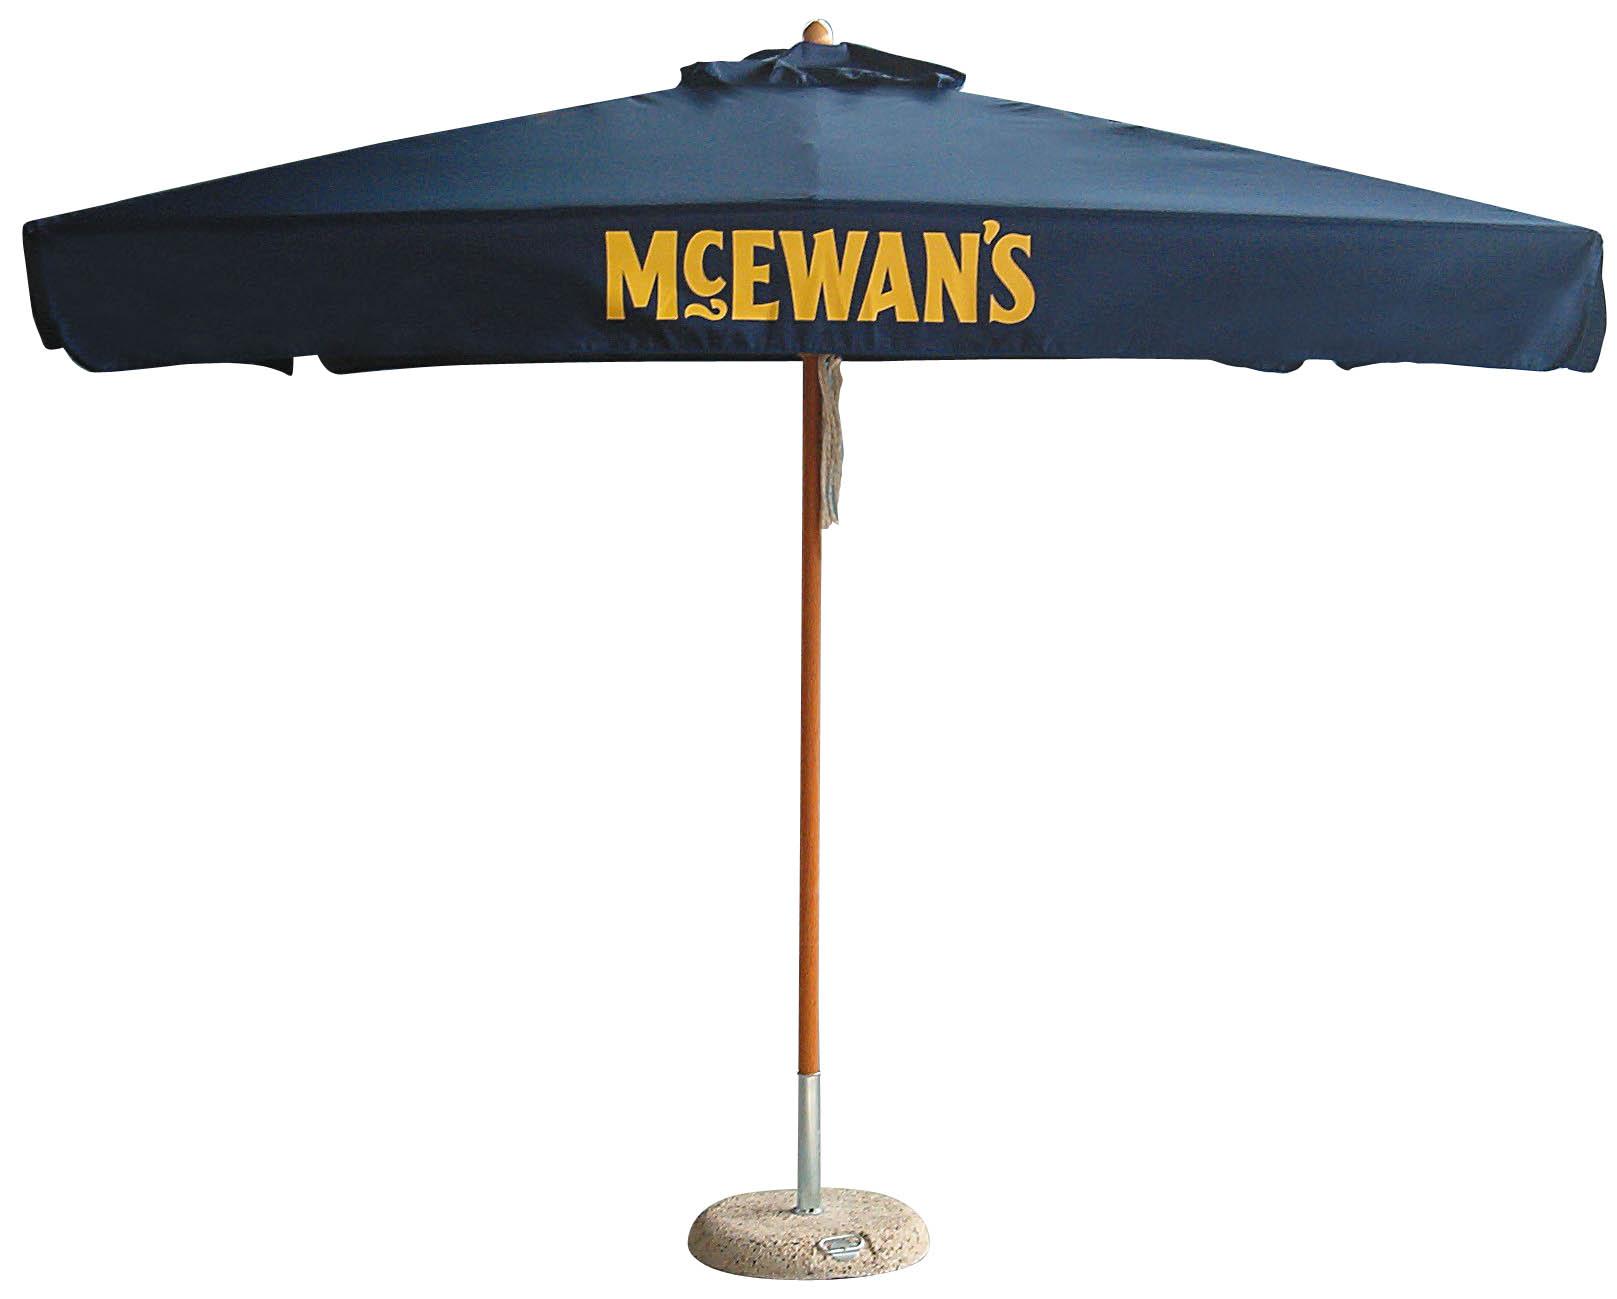 scolaro promo srl advertising parasols scolaro promo srl. Black Bedroom Furniture Sets. Home Design Ideas